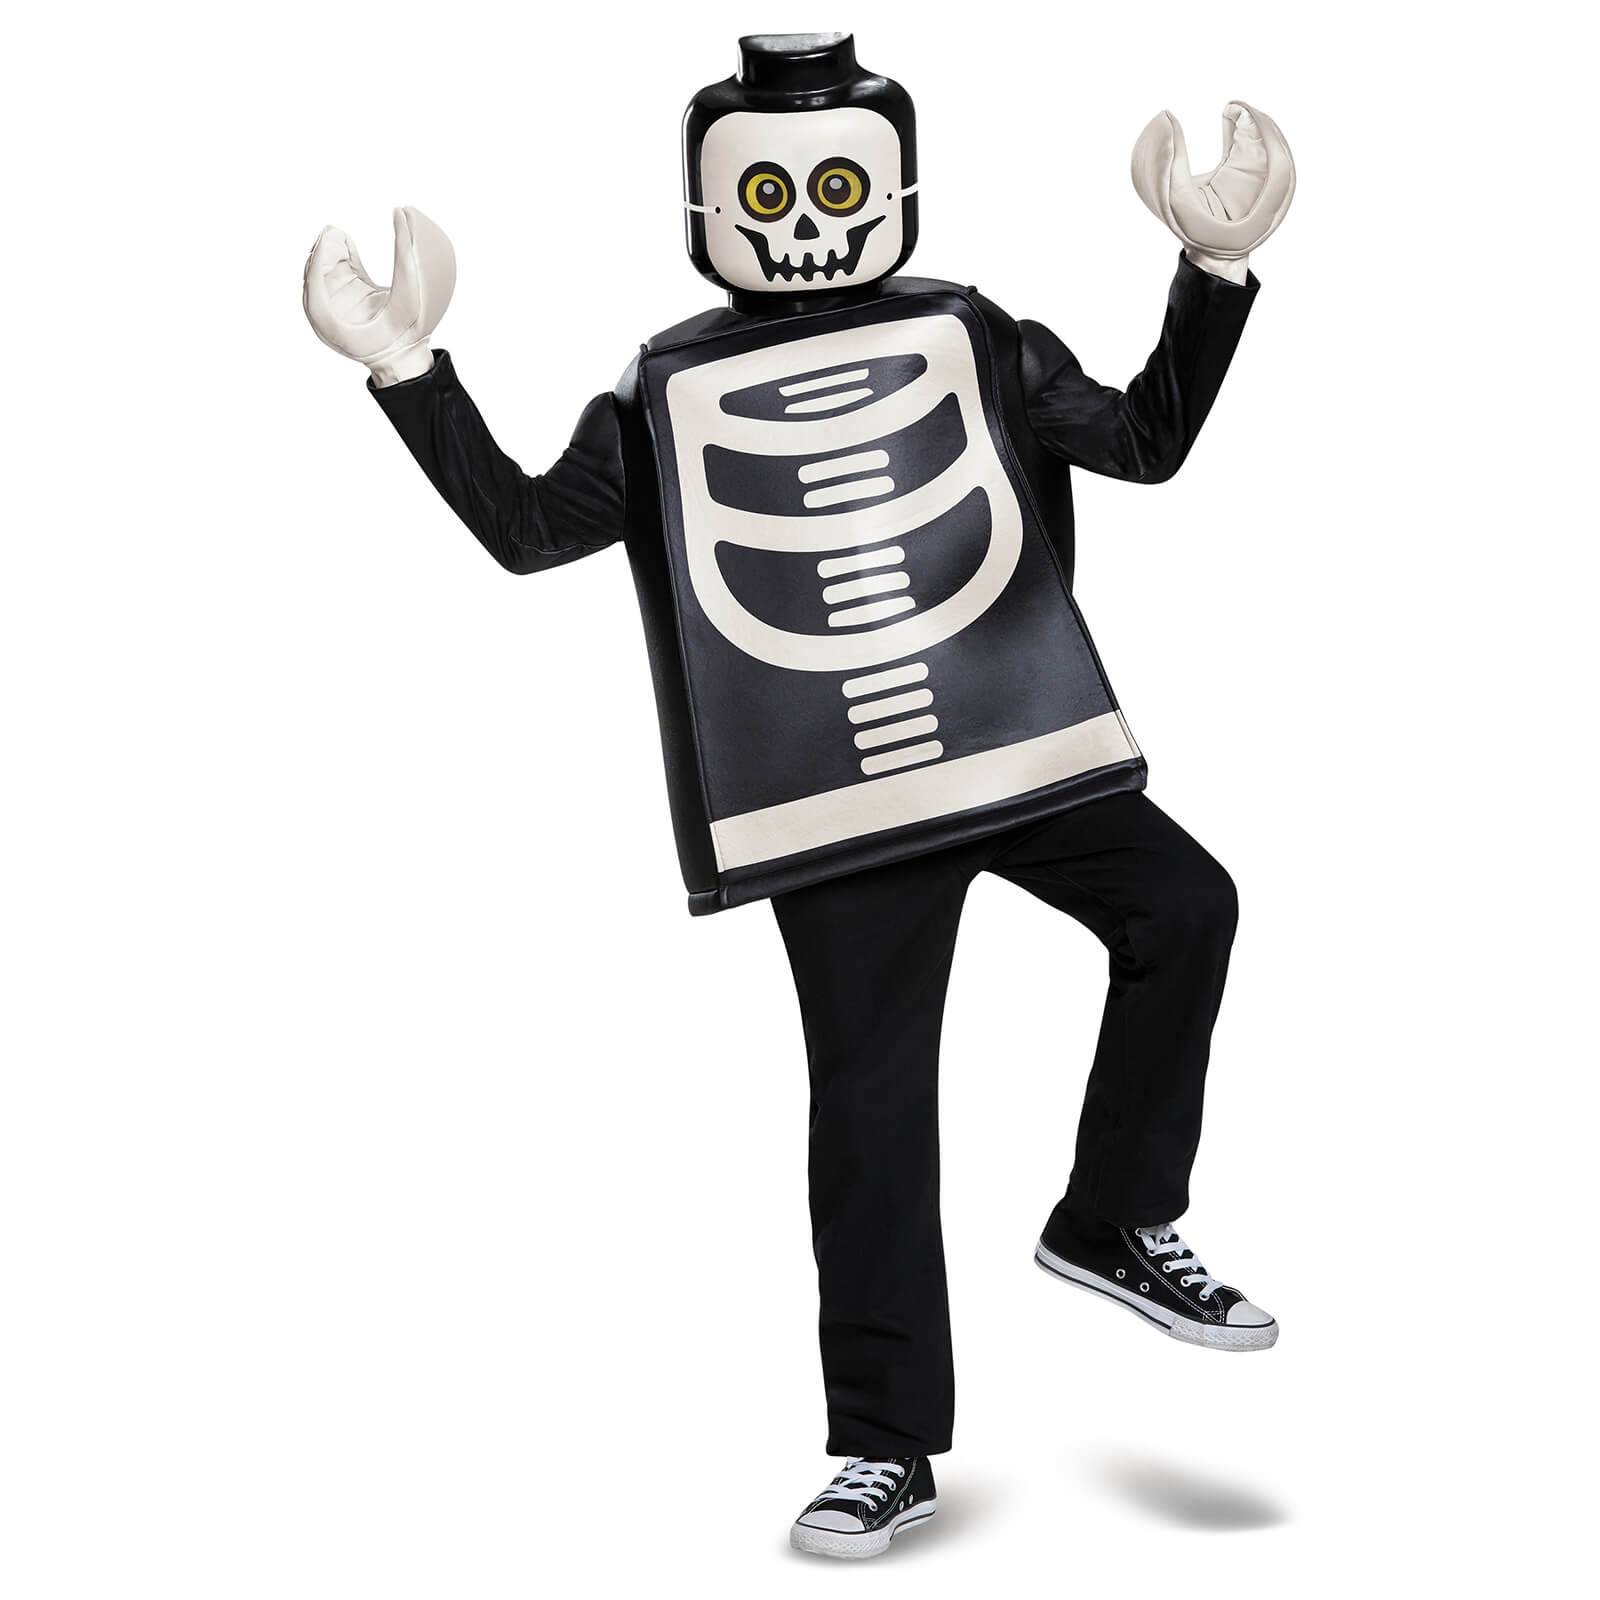 Lego Iconic Kids Skeleton Classic Halloween Fancy Dress - Black - S/4-6 Years - Black